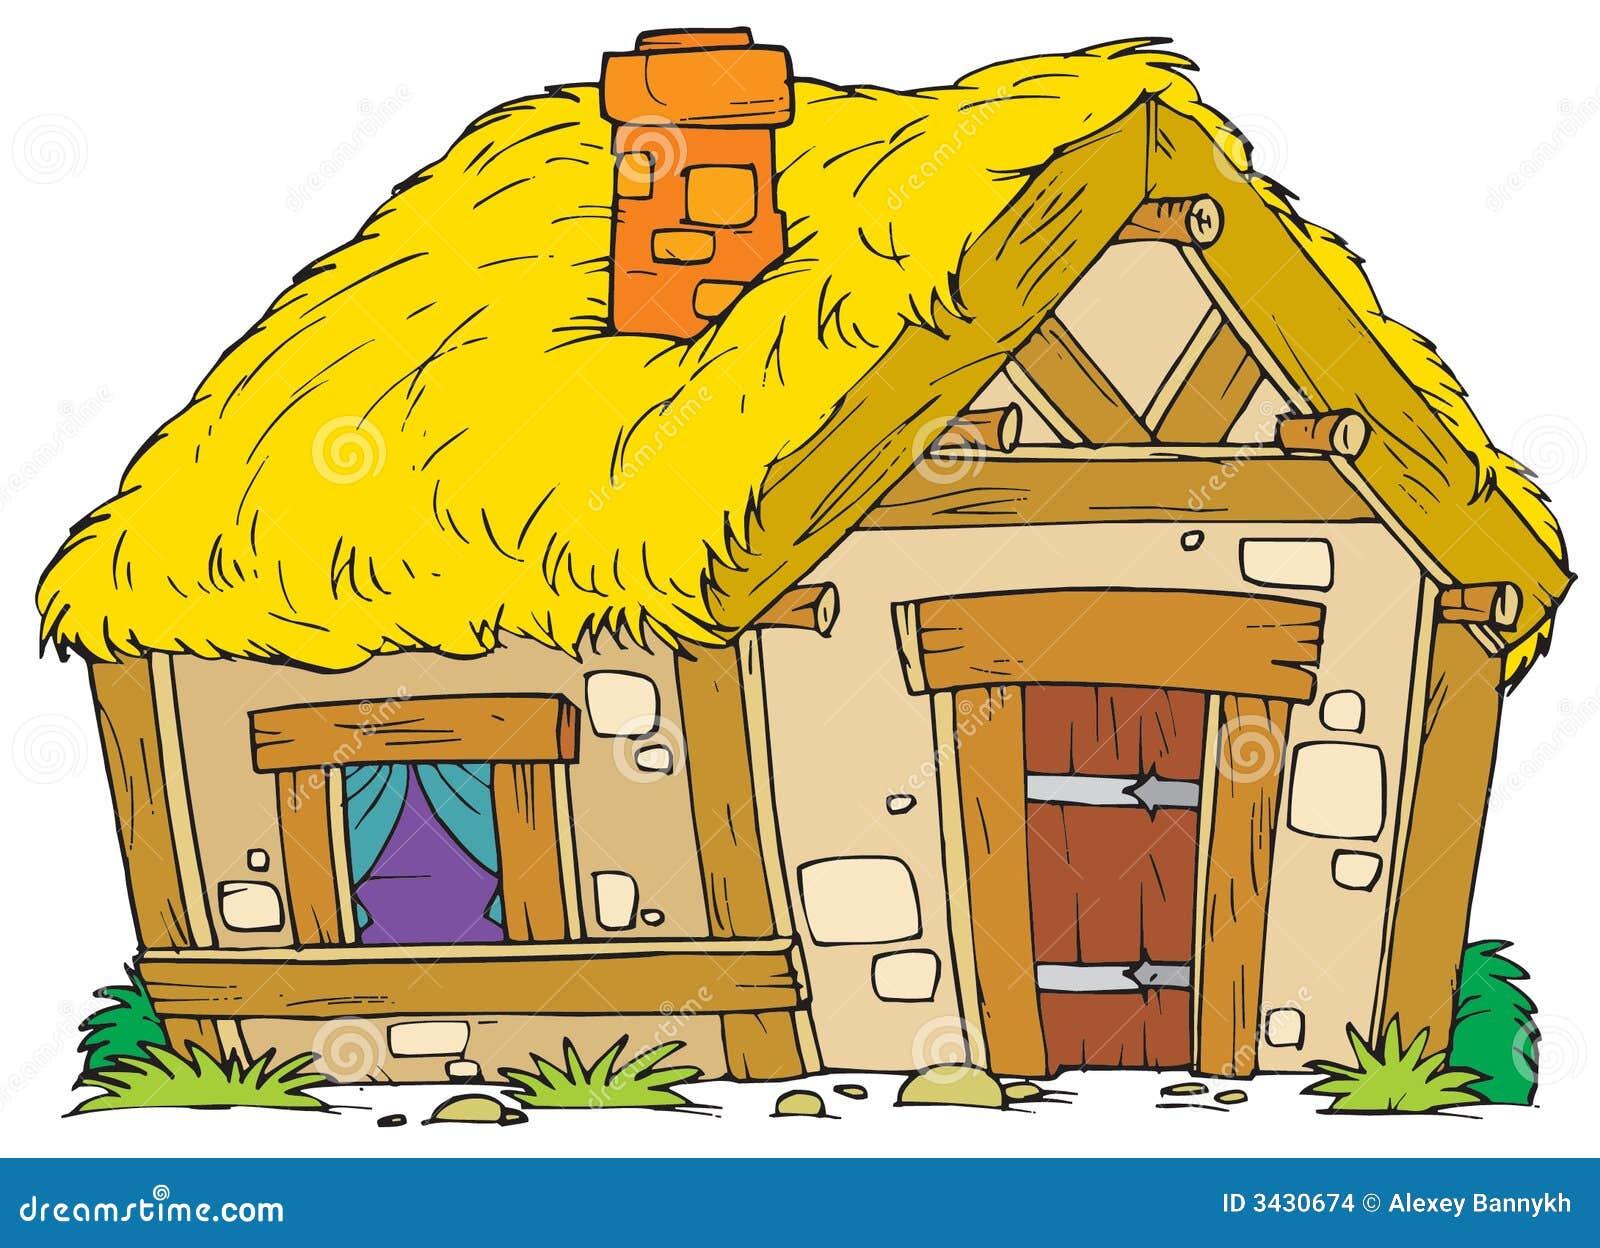 Old rural house stock images image 3430674 - Casa rural de madera ...